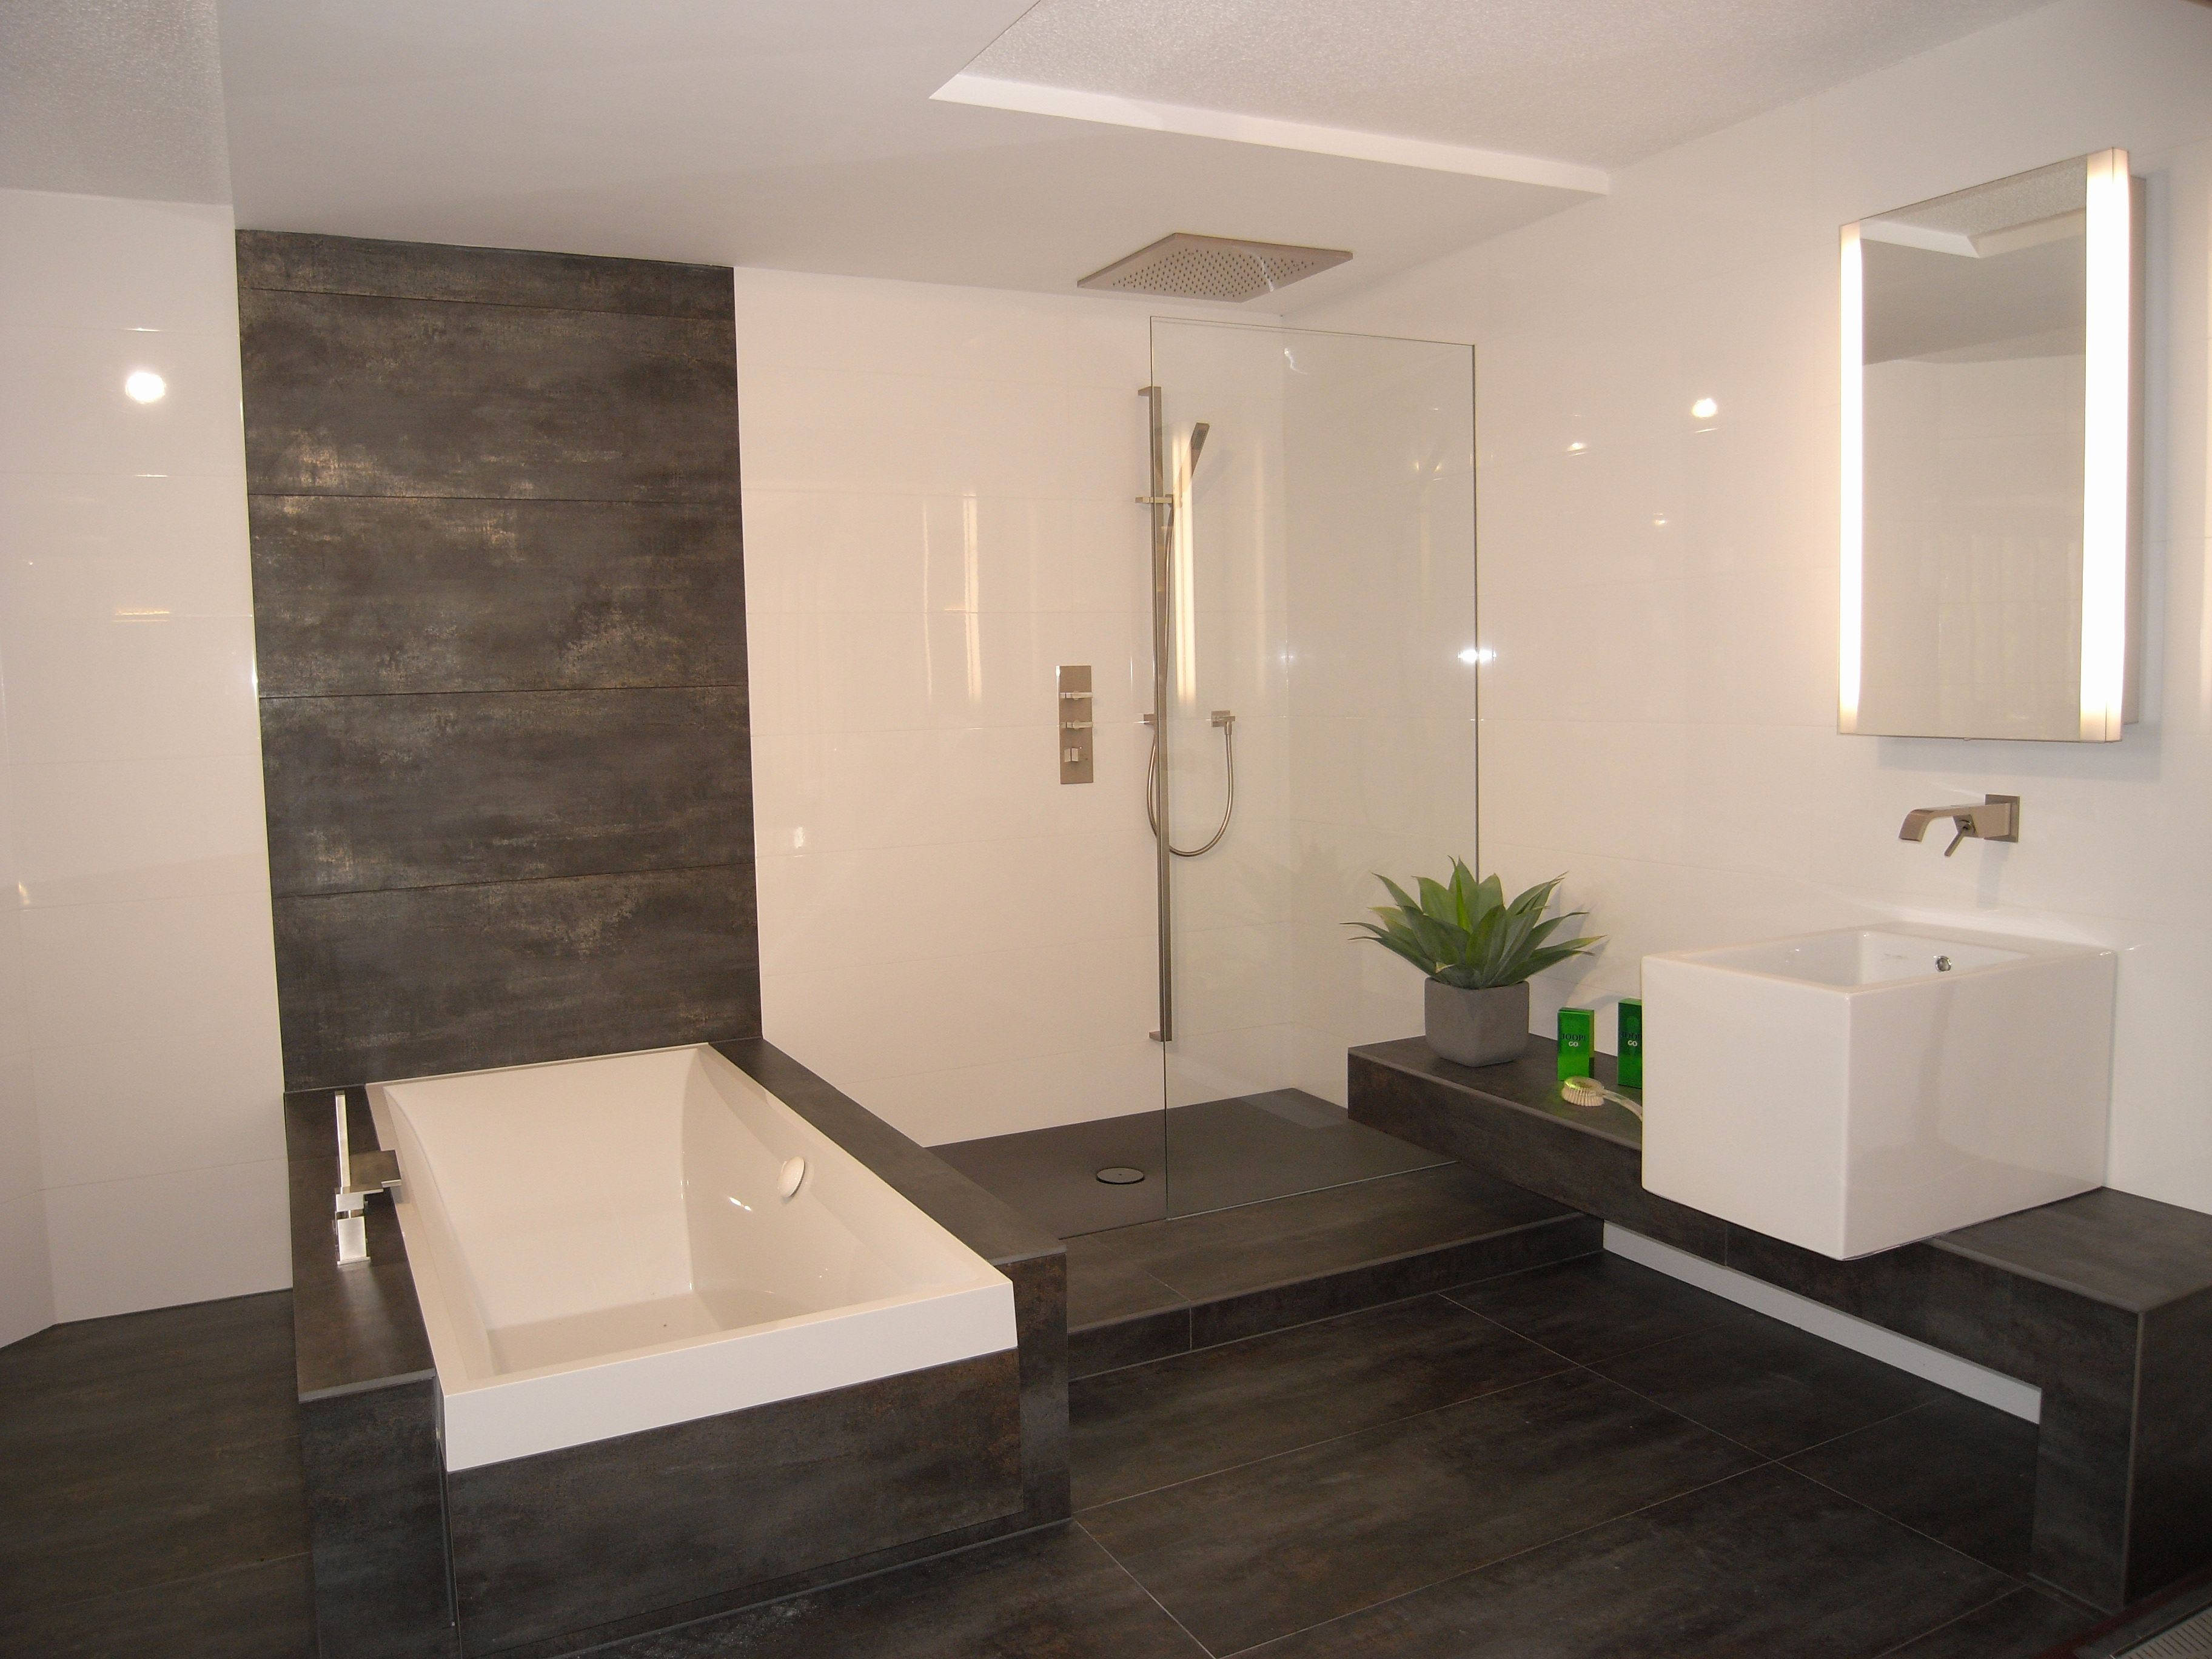 badezimmer  Google zoeken  Toilet n kitchen  Badezimmer